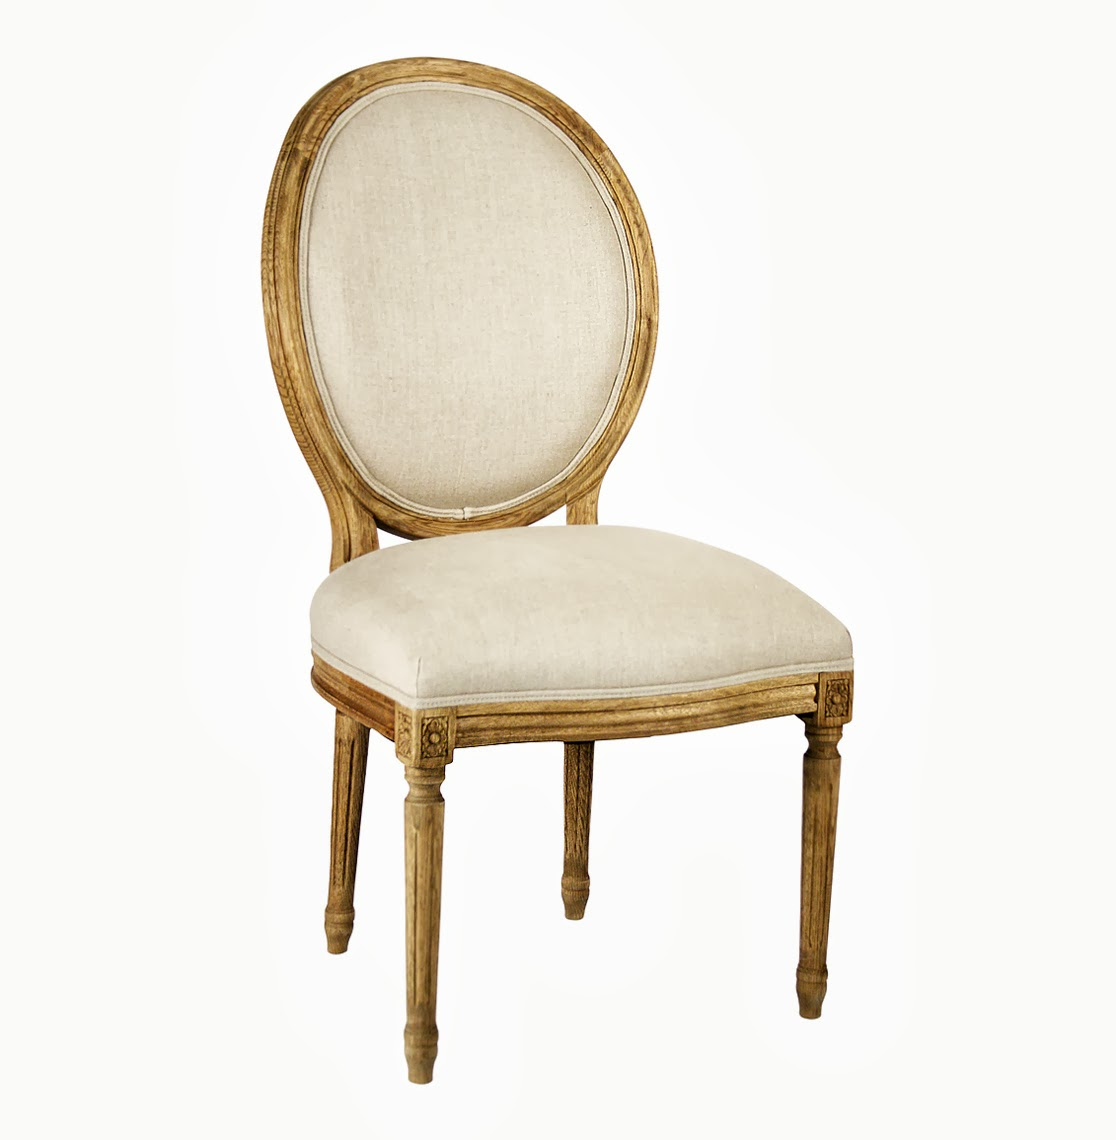 Oval Back Dining Chairs Cigar Lounge Desert Girls Vintage September 2013